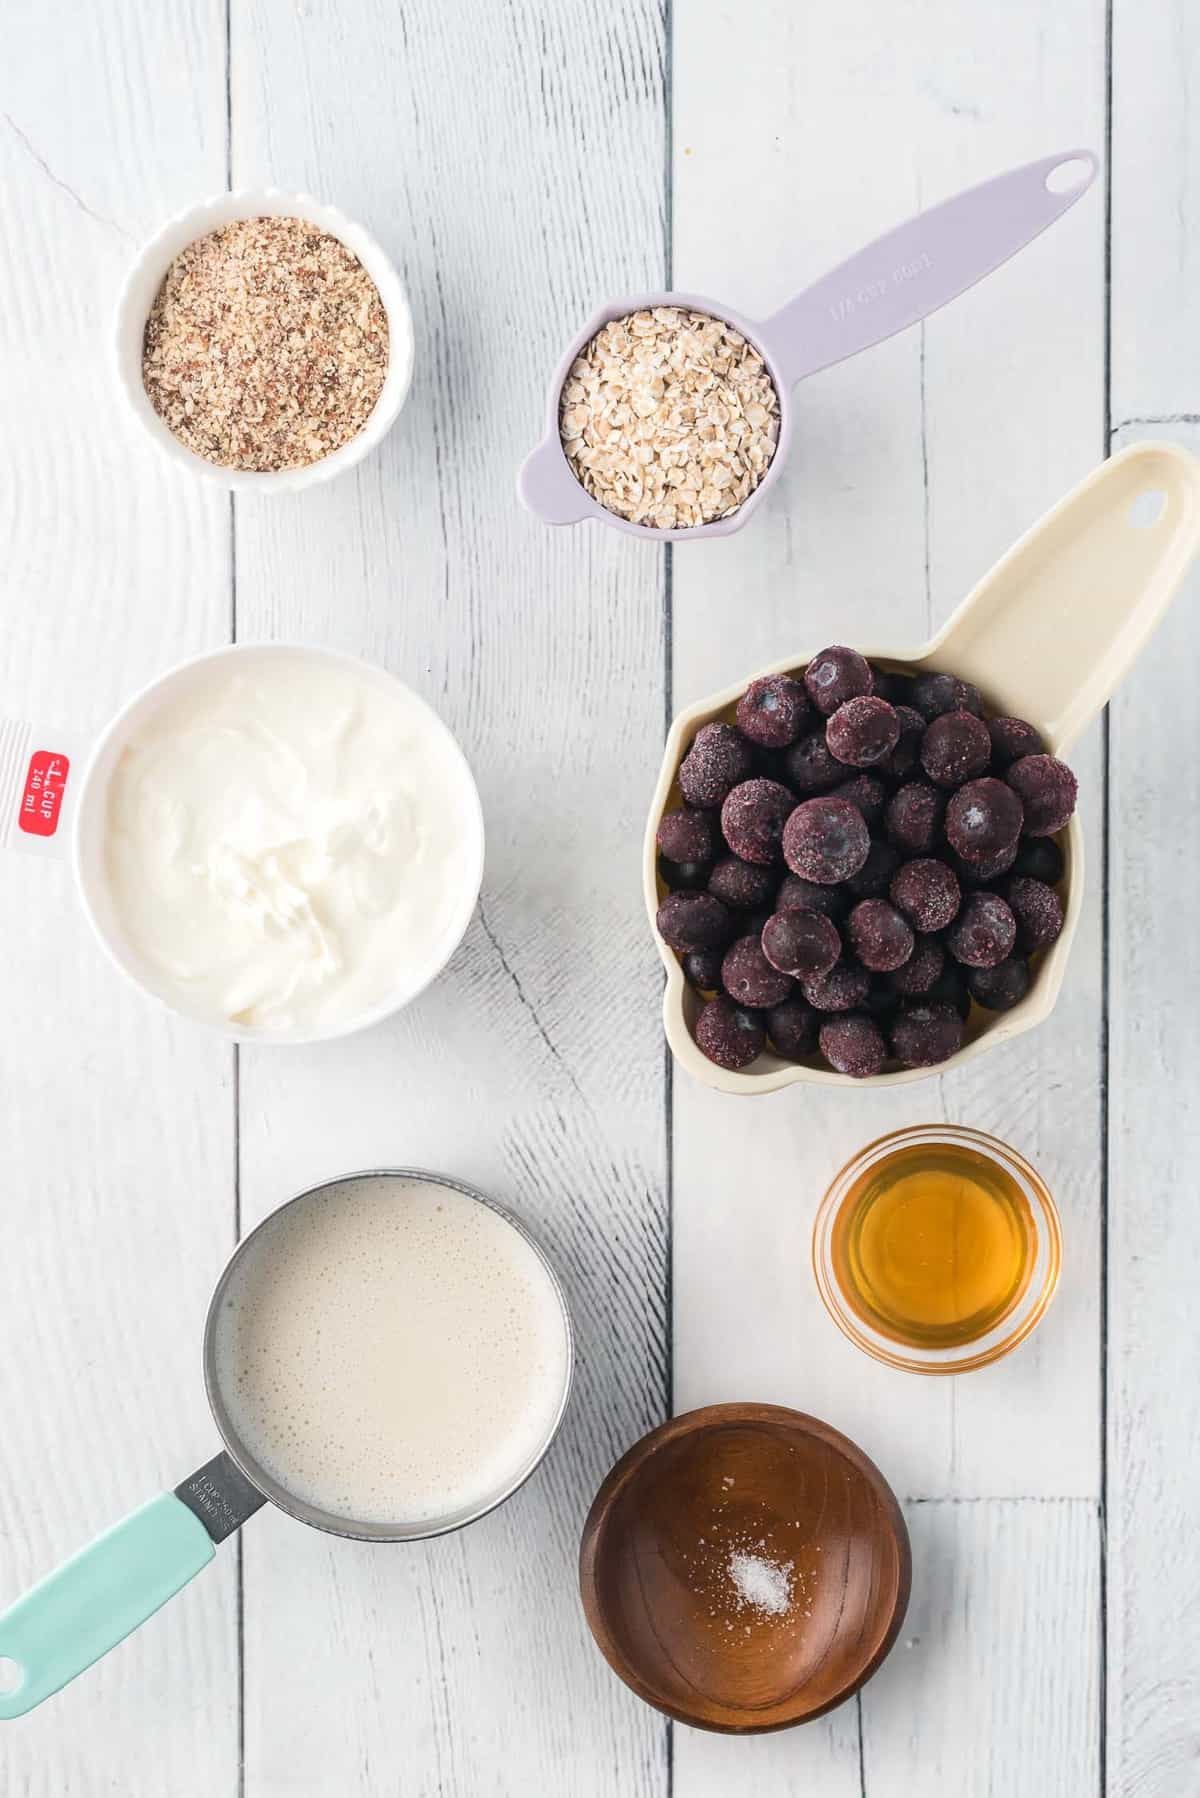 Small bowls of ingredients, blueberries, honey, almonds, yogurt, milk.